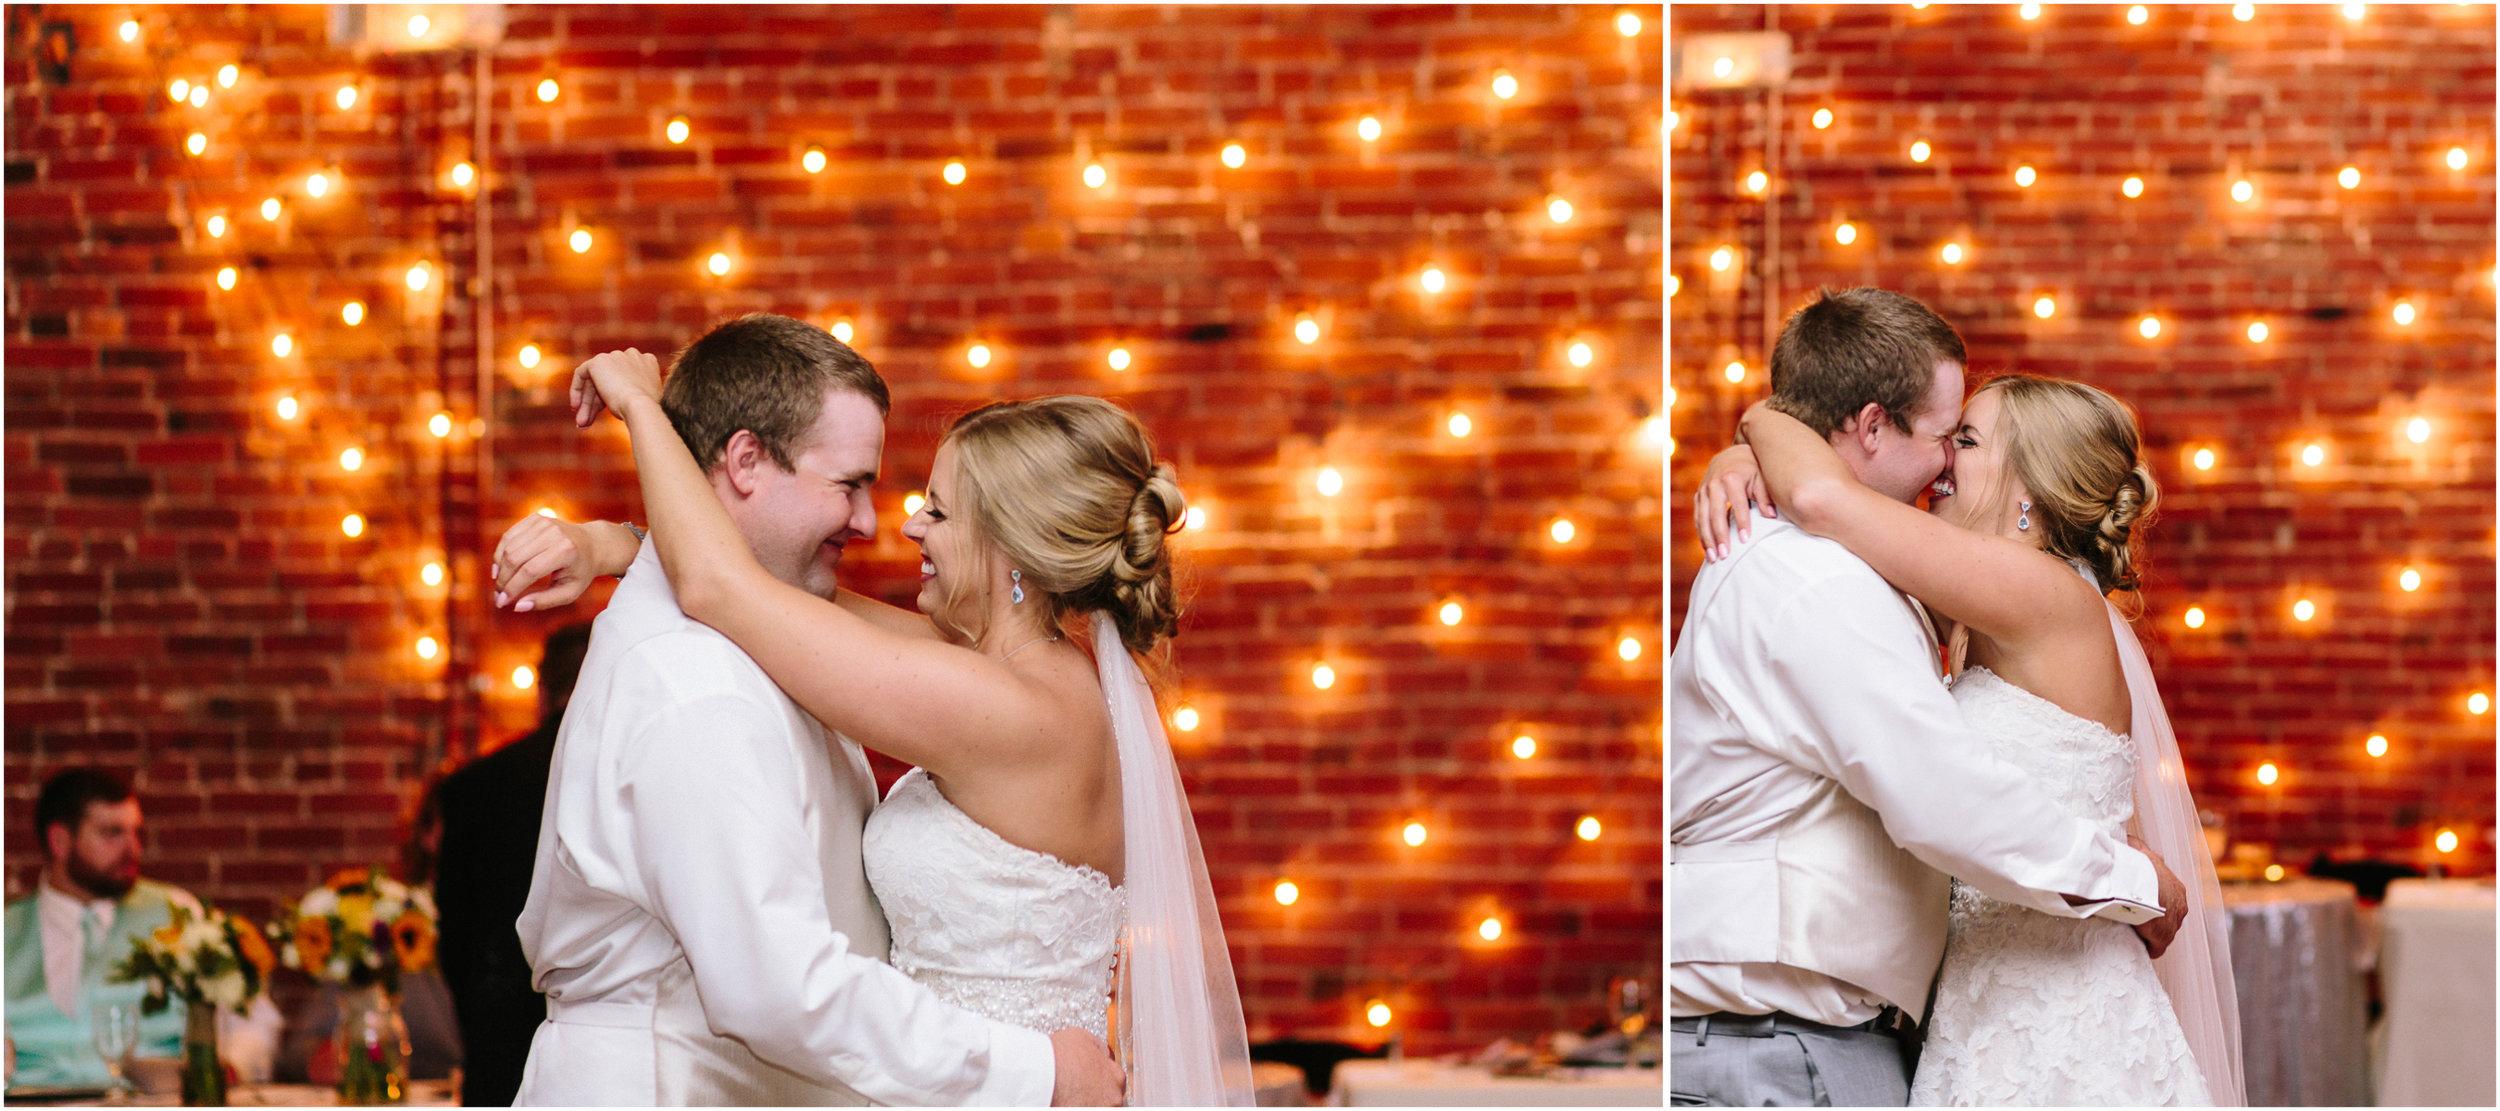 alyssa barletter photography louisburg kansas town square paola rustic wedding-50.jpg